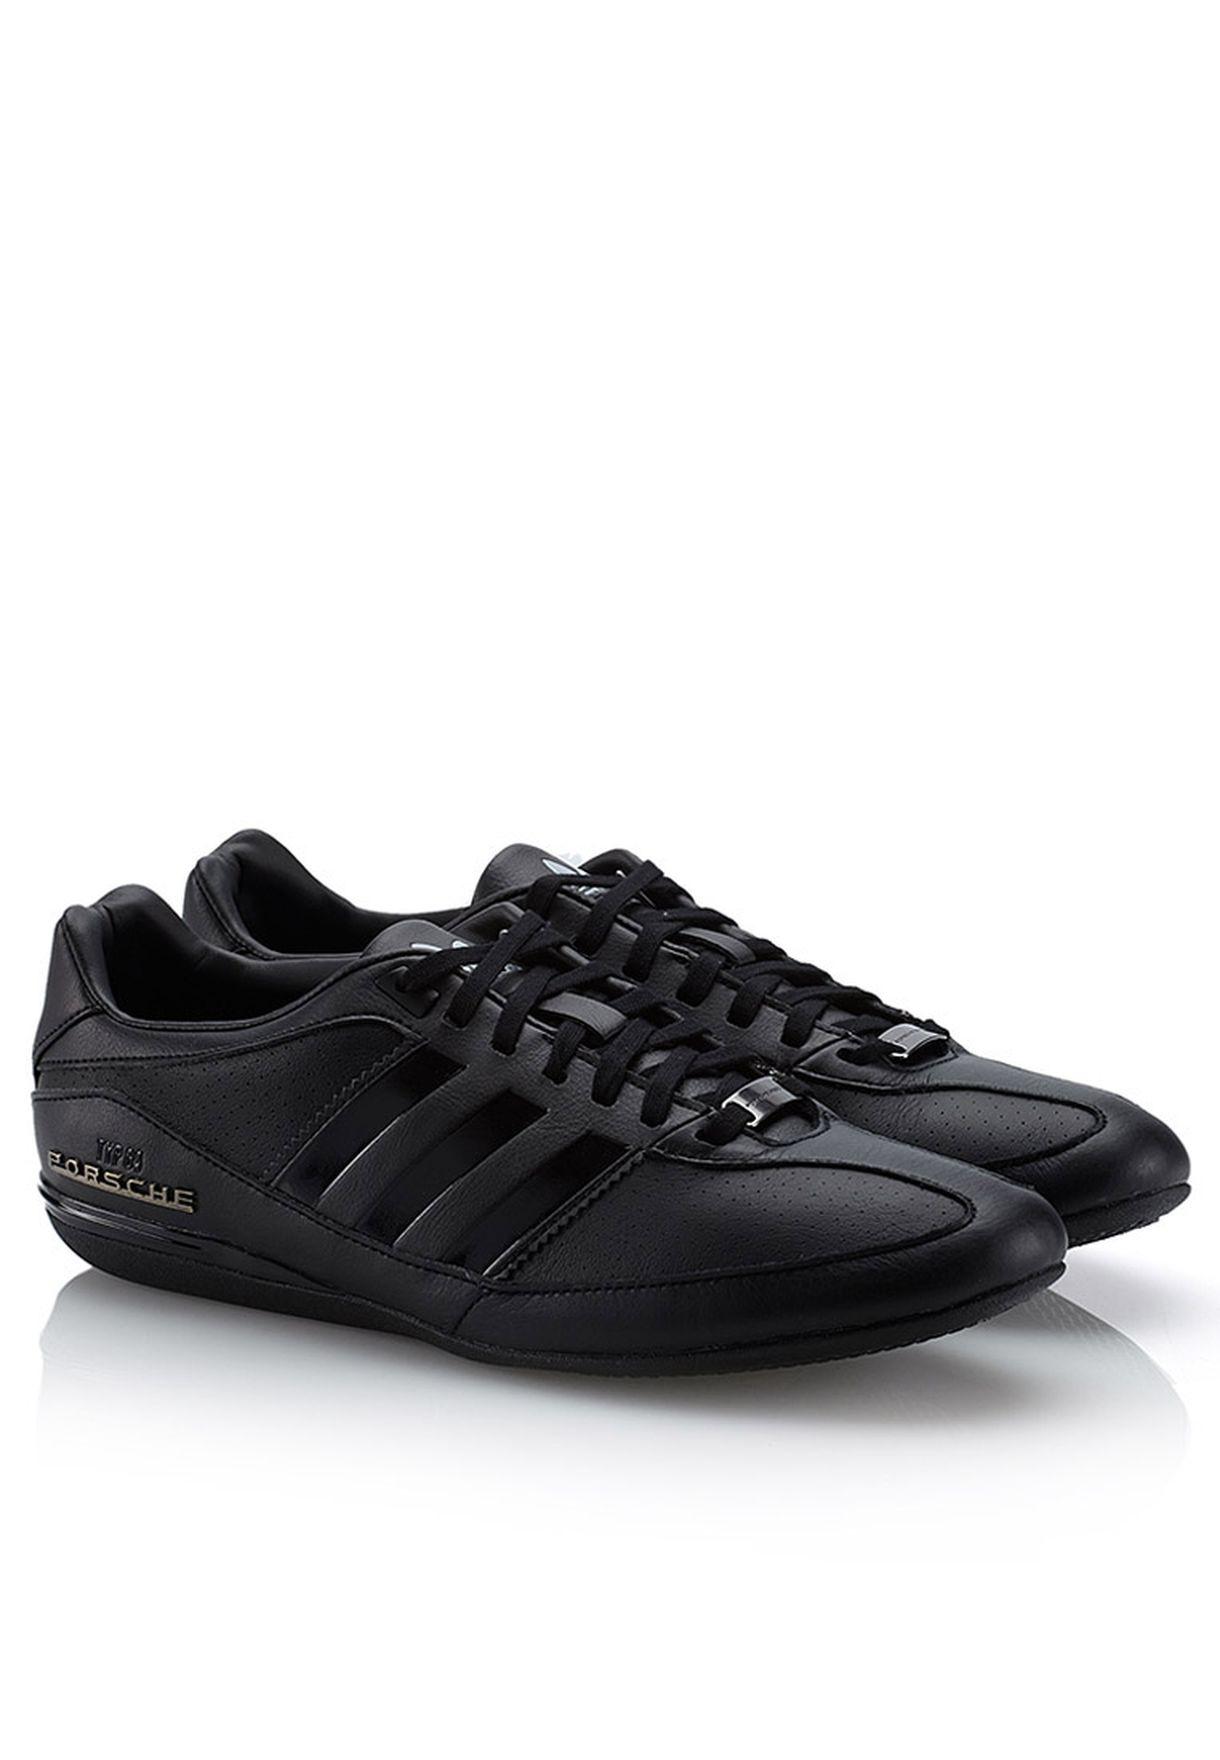 purchase cheap 0da18 d99de Shop adidas Originals black Porsche Typ 64 Q23134 for Men in UAE ...